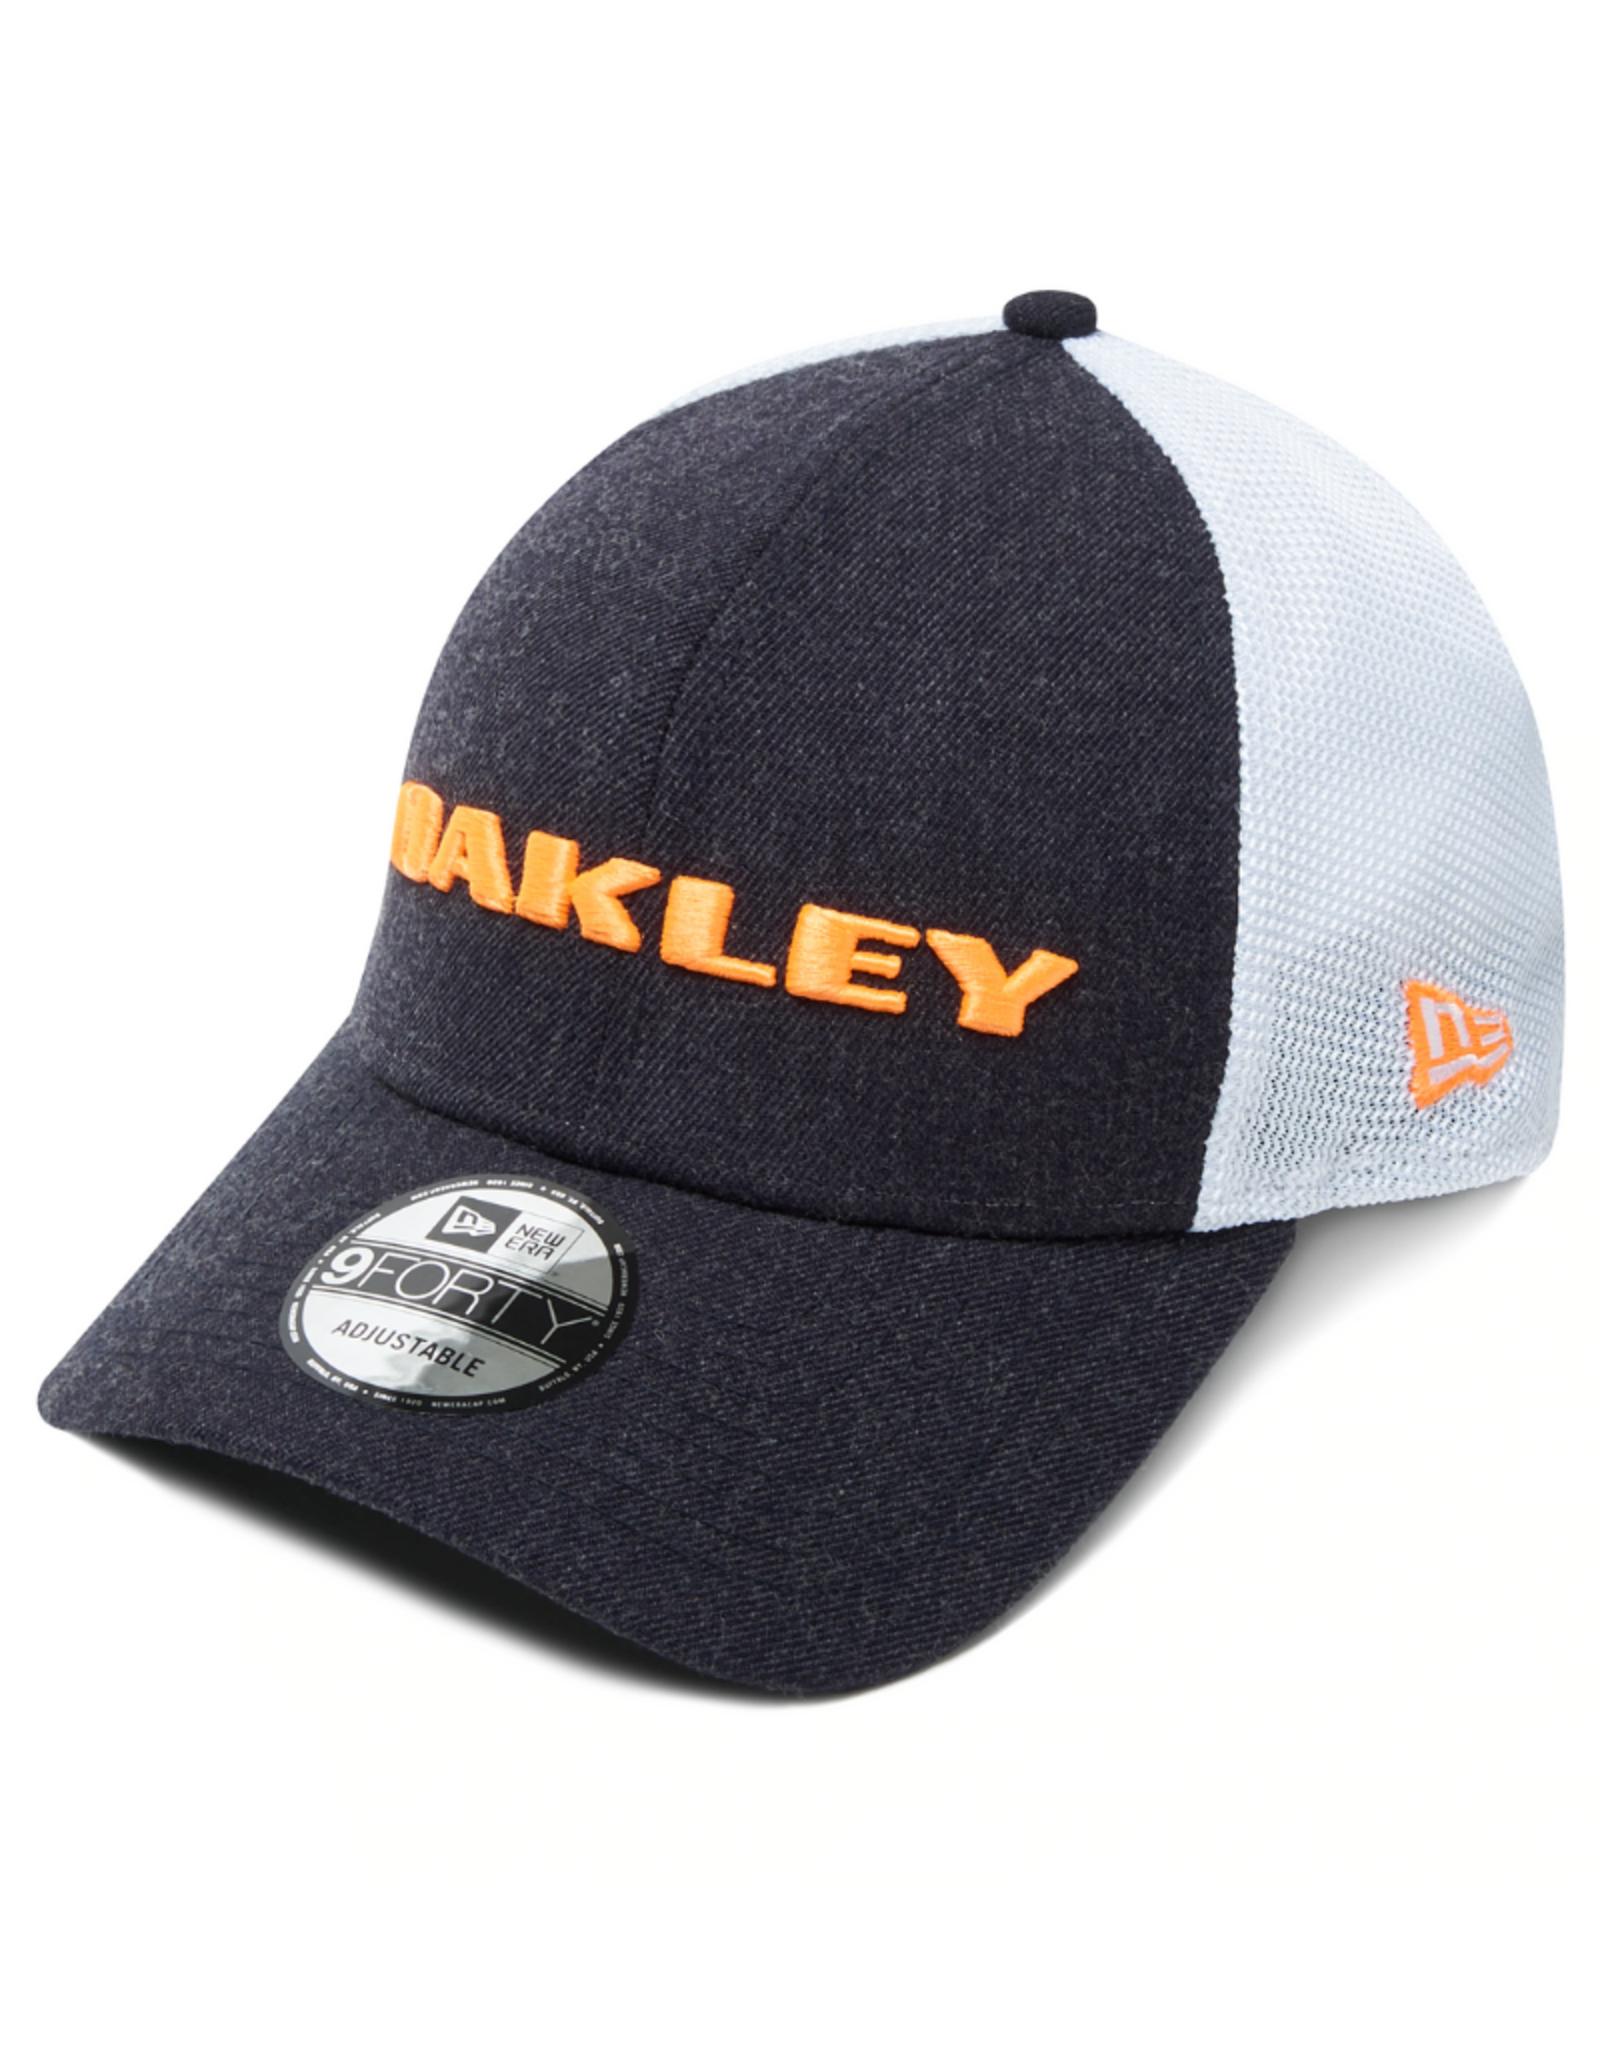 Oakley Men's Heather New Era Adjustable Hat Navy White